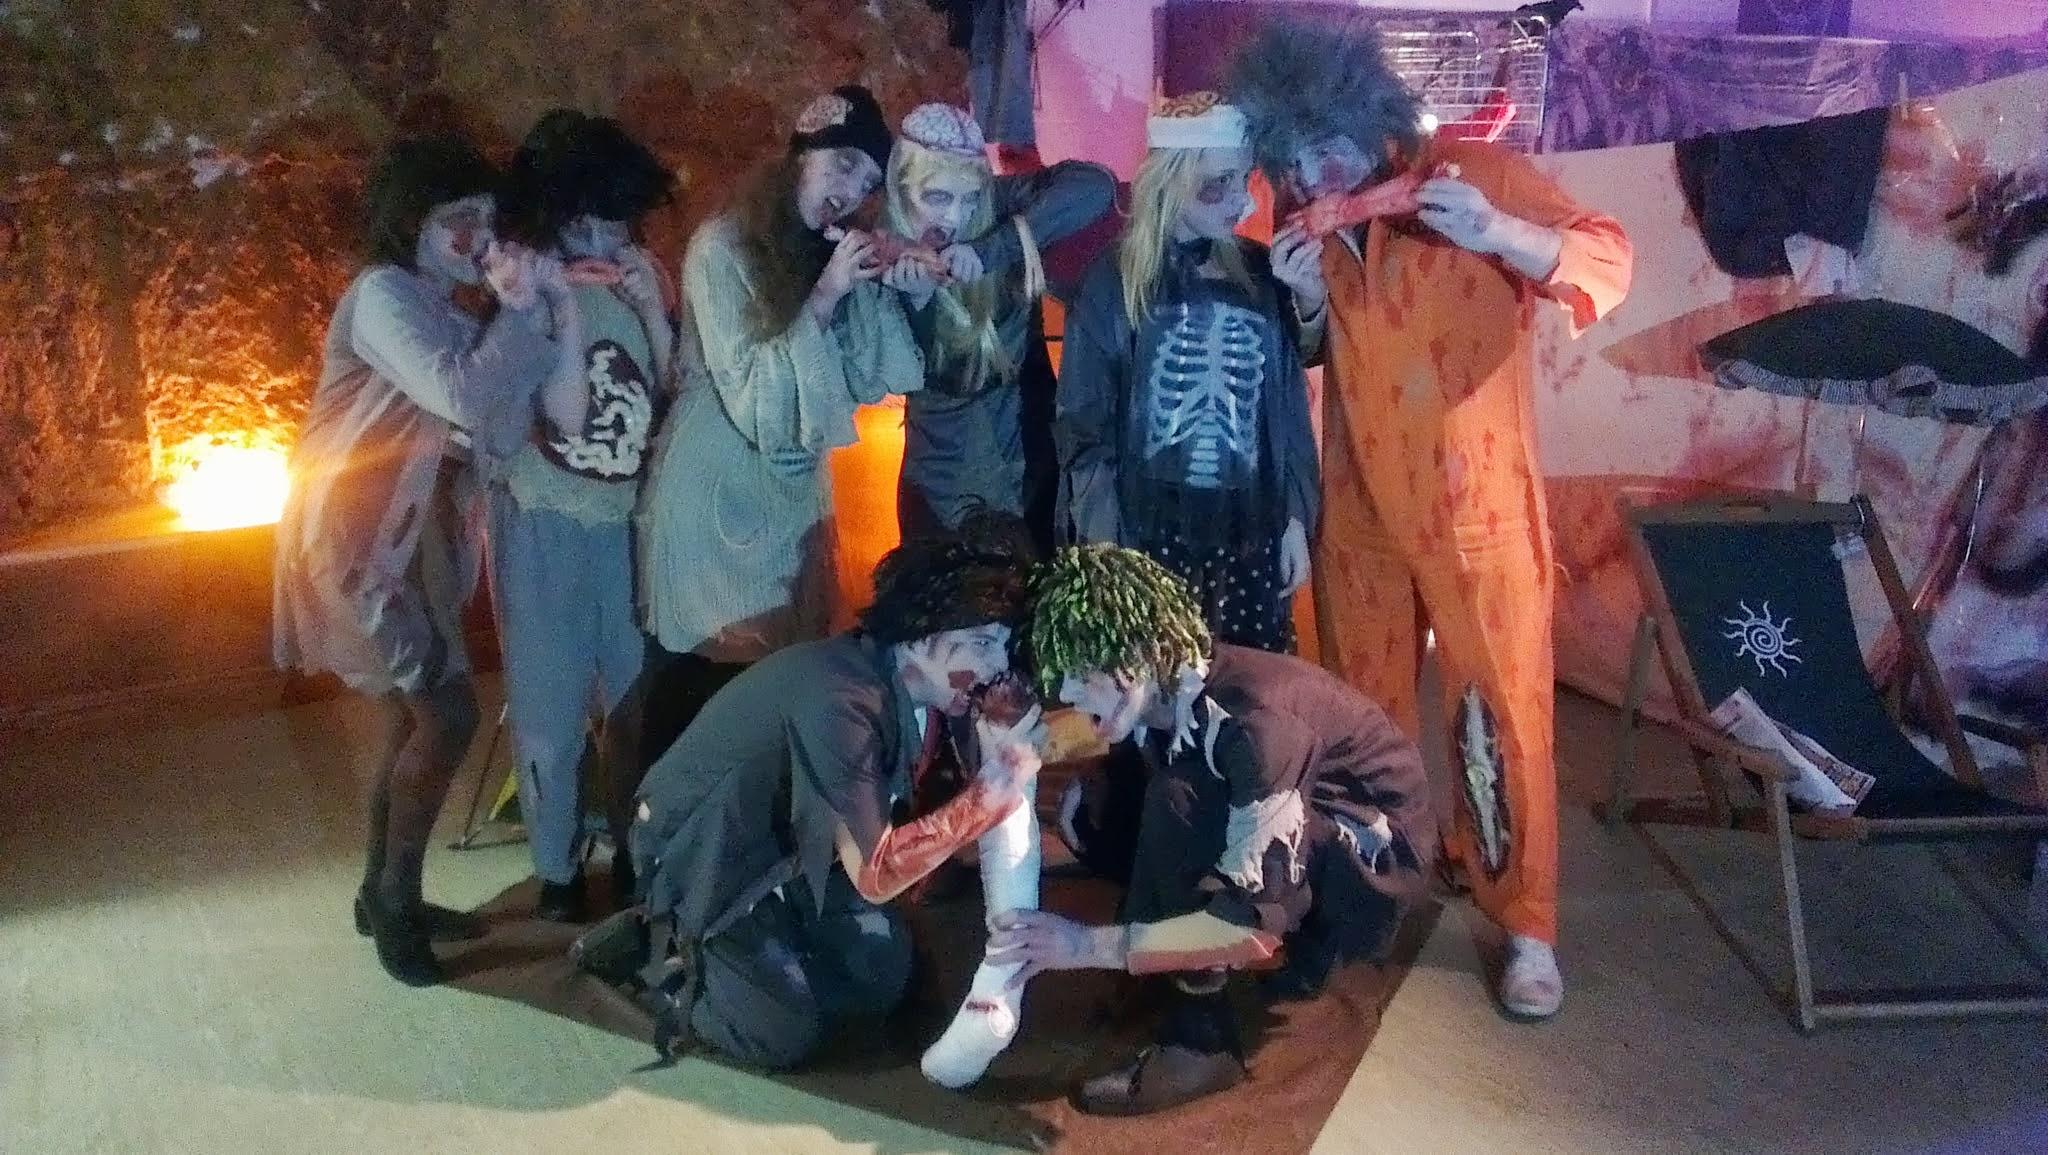 Phoenix Theatre's Walking Dead zombie performers